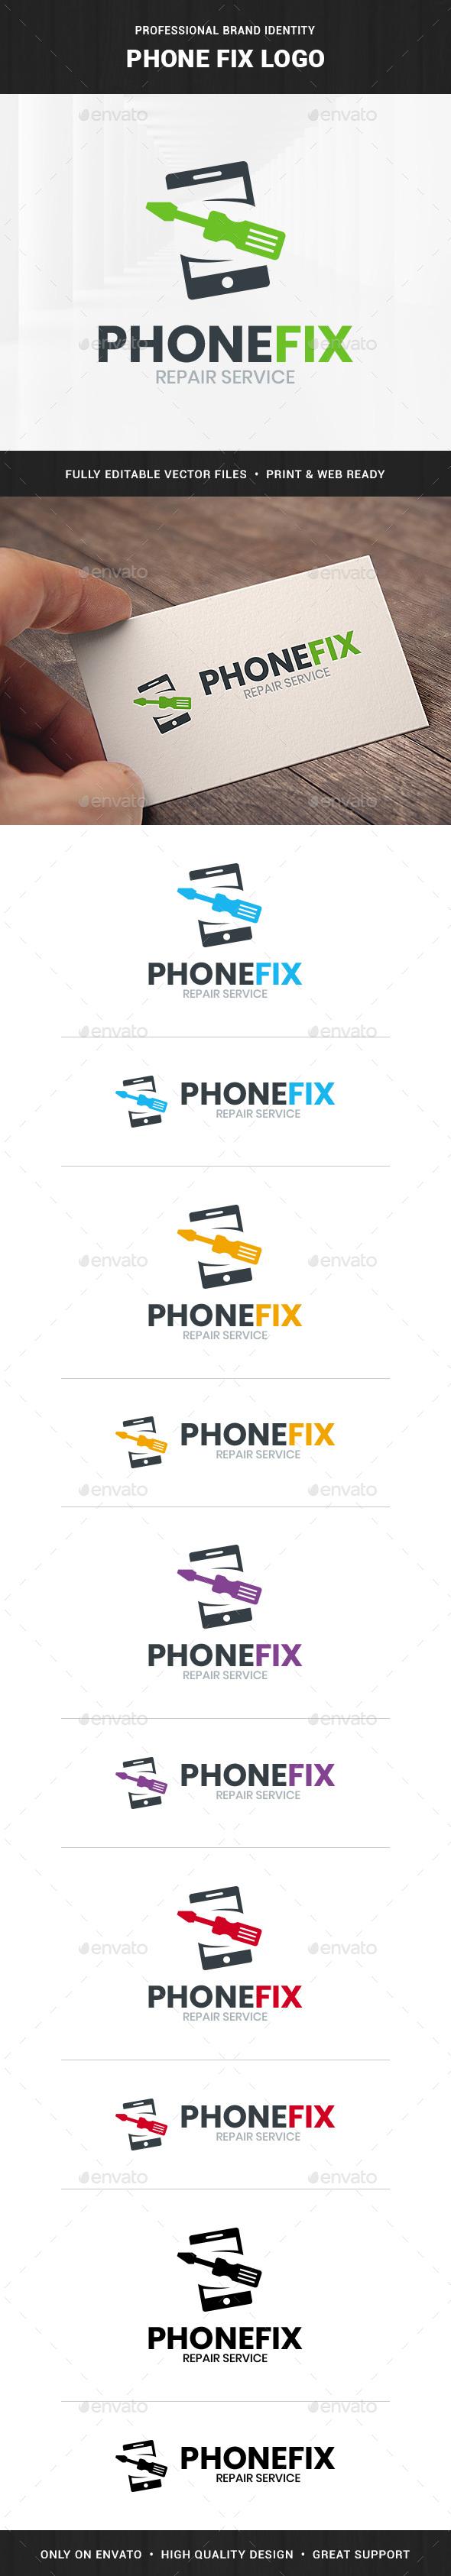 Phone Fix Logo Template